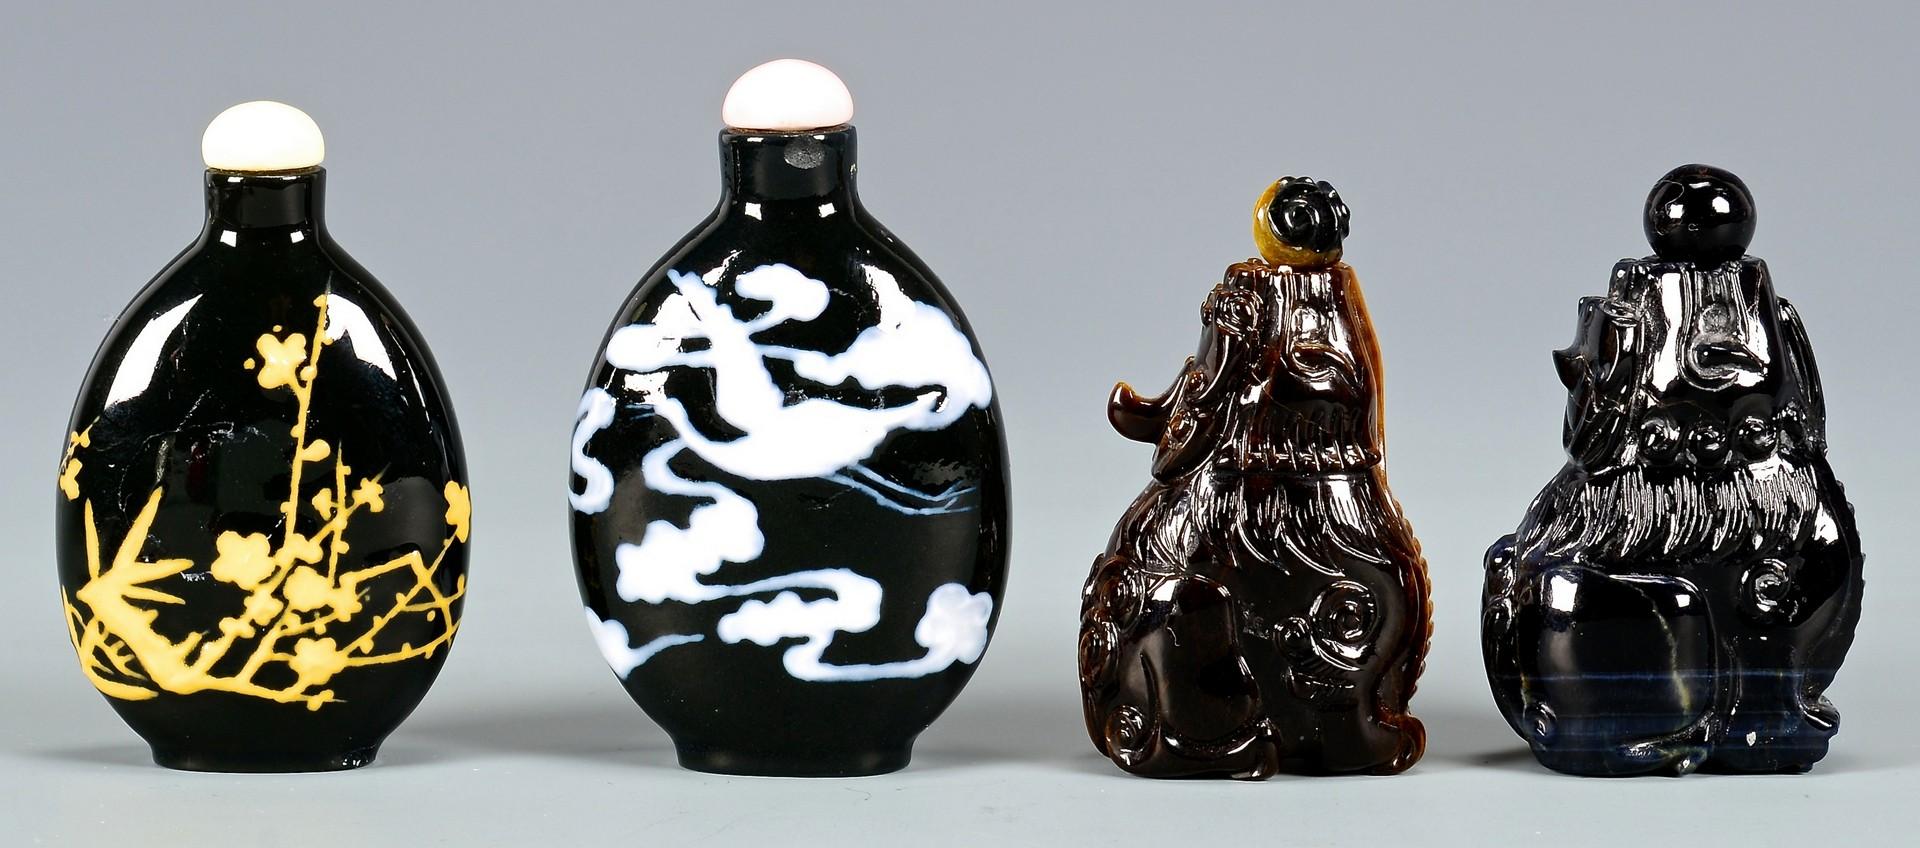 Lot 399: 6 Chinese Glass & Stone Snuff Bottles